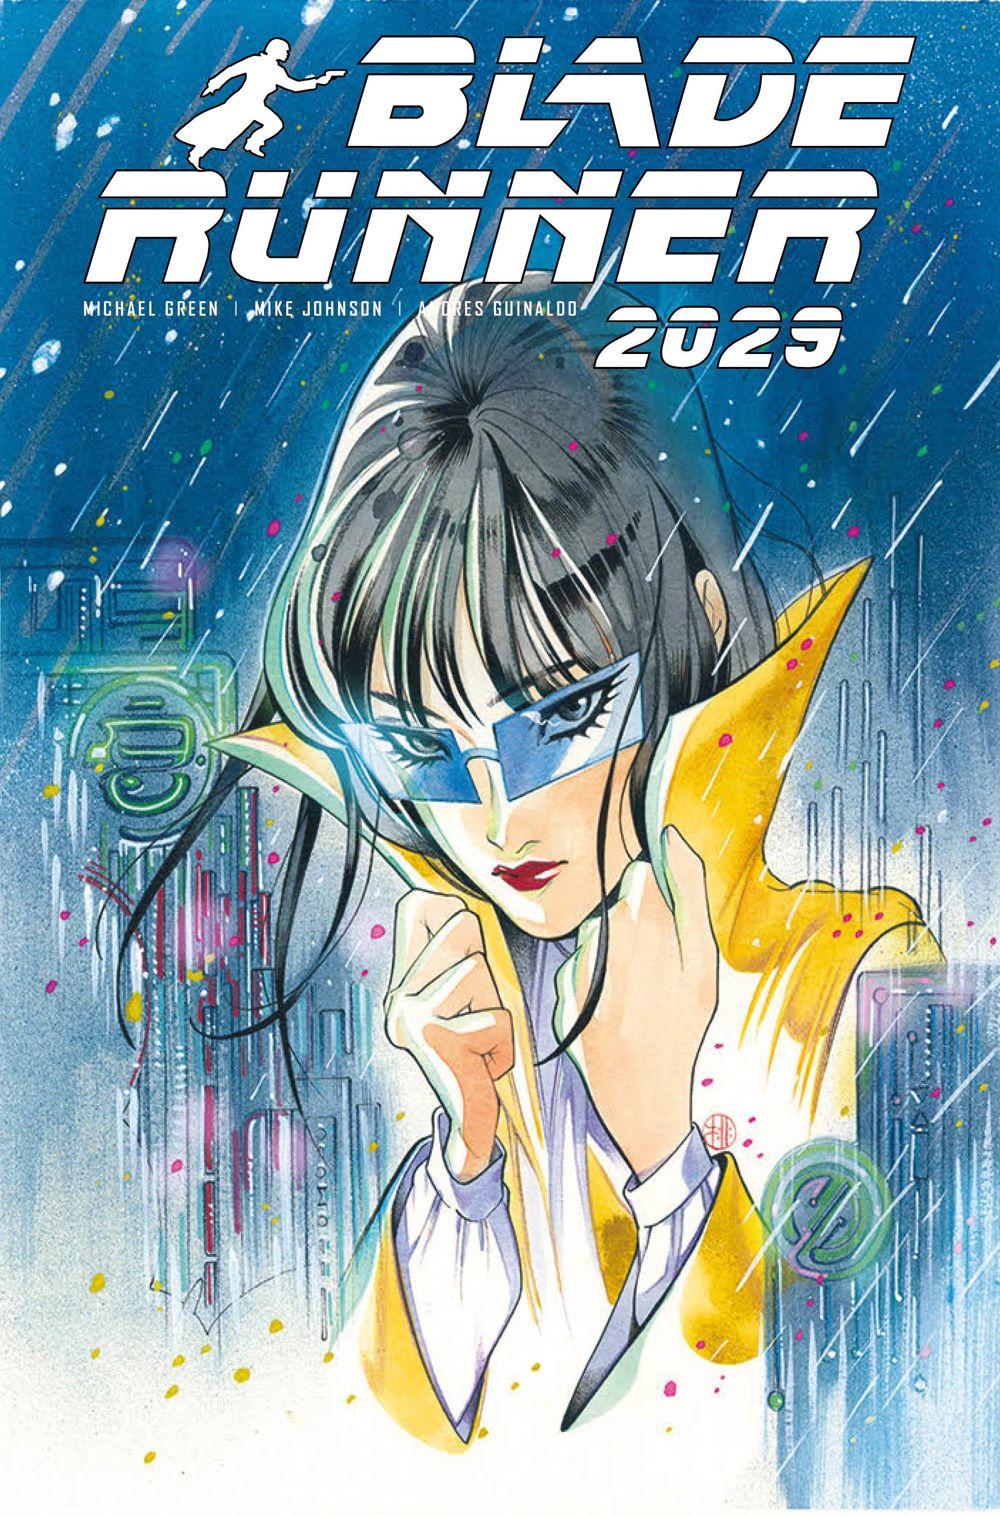 BR2029_1-MOMOKO.jpg Titan Comics May 2021 Solicitations